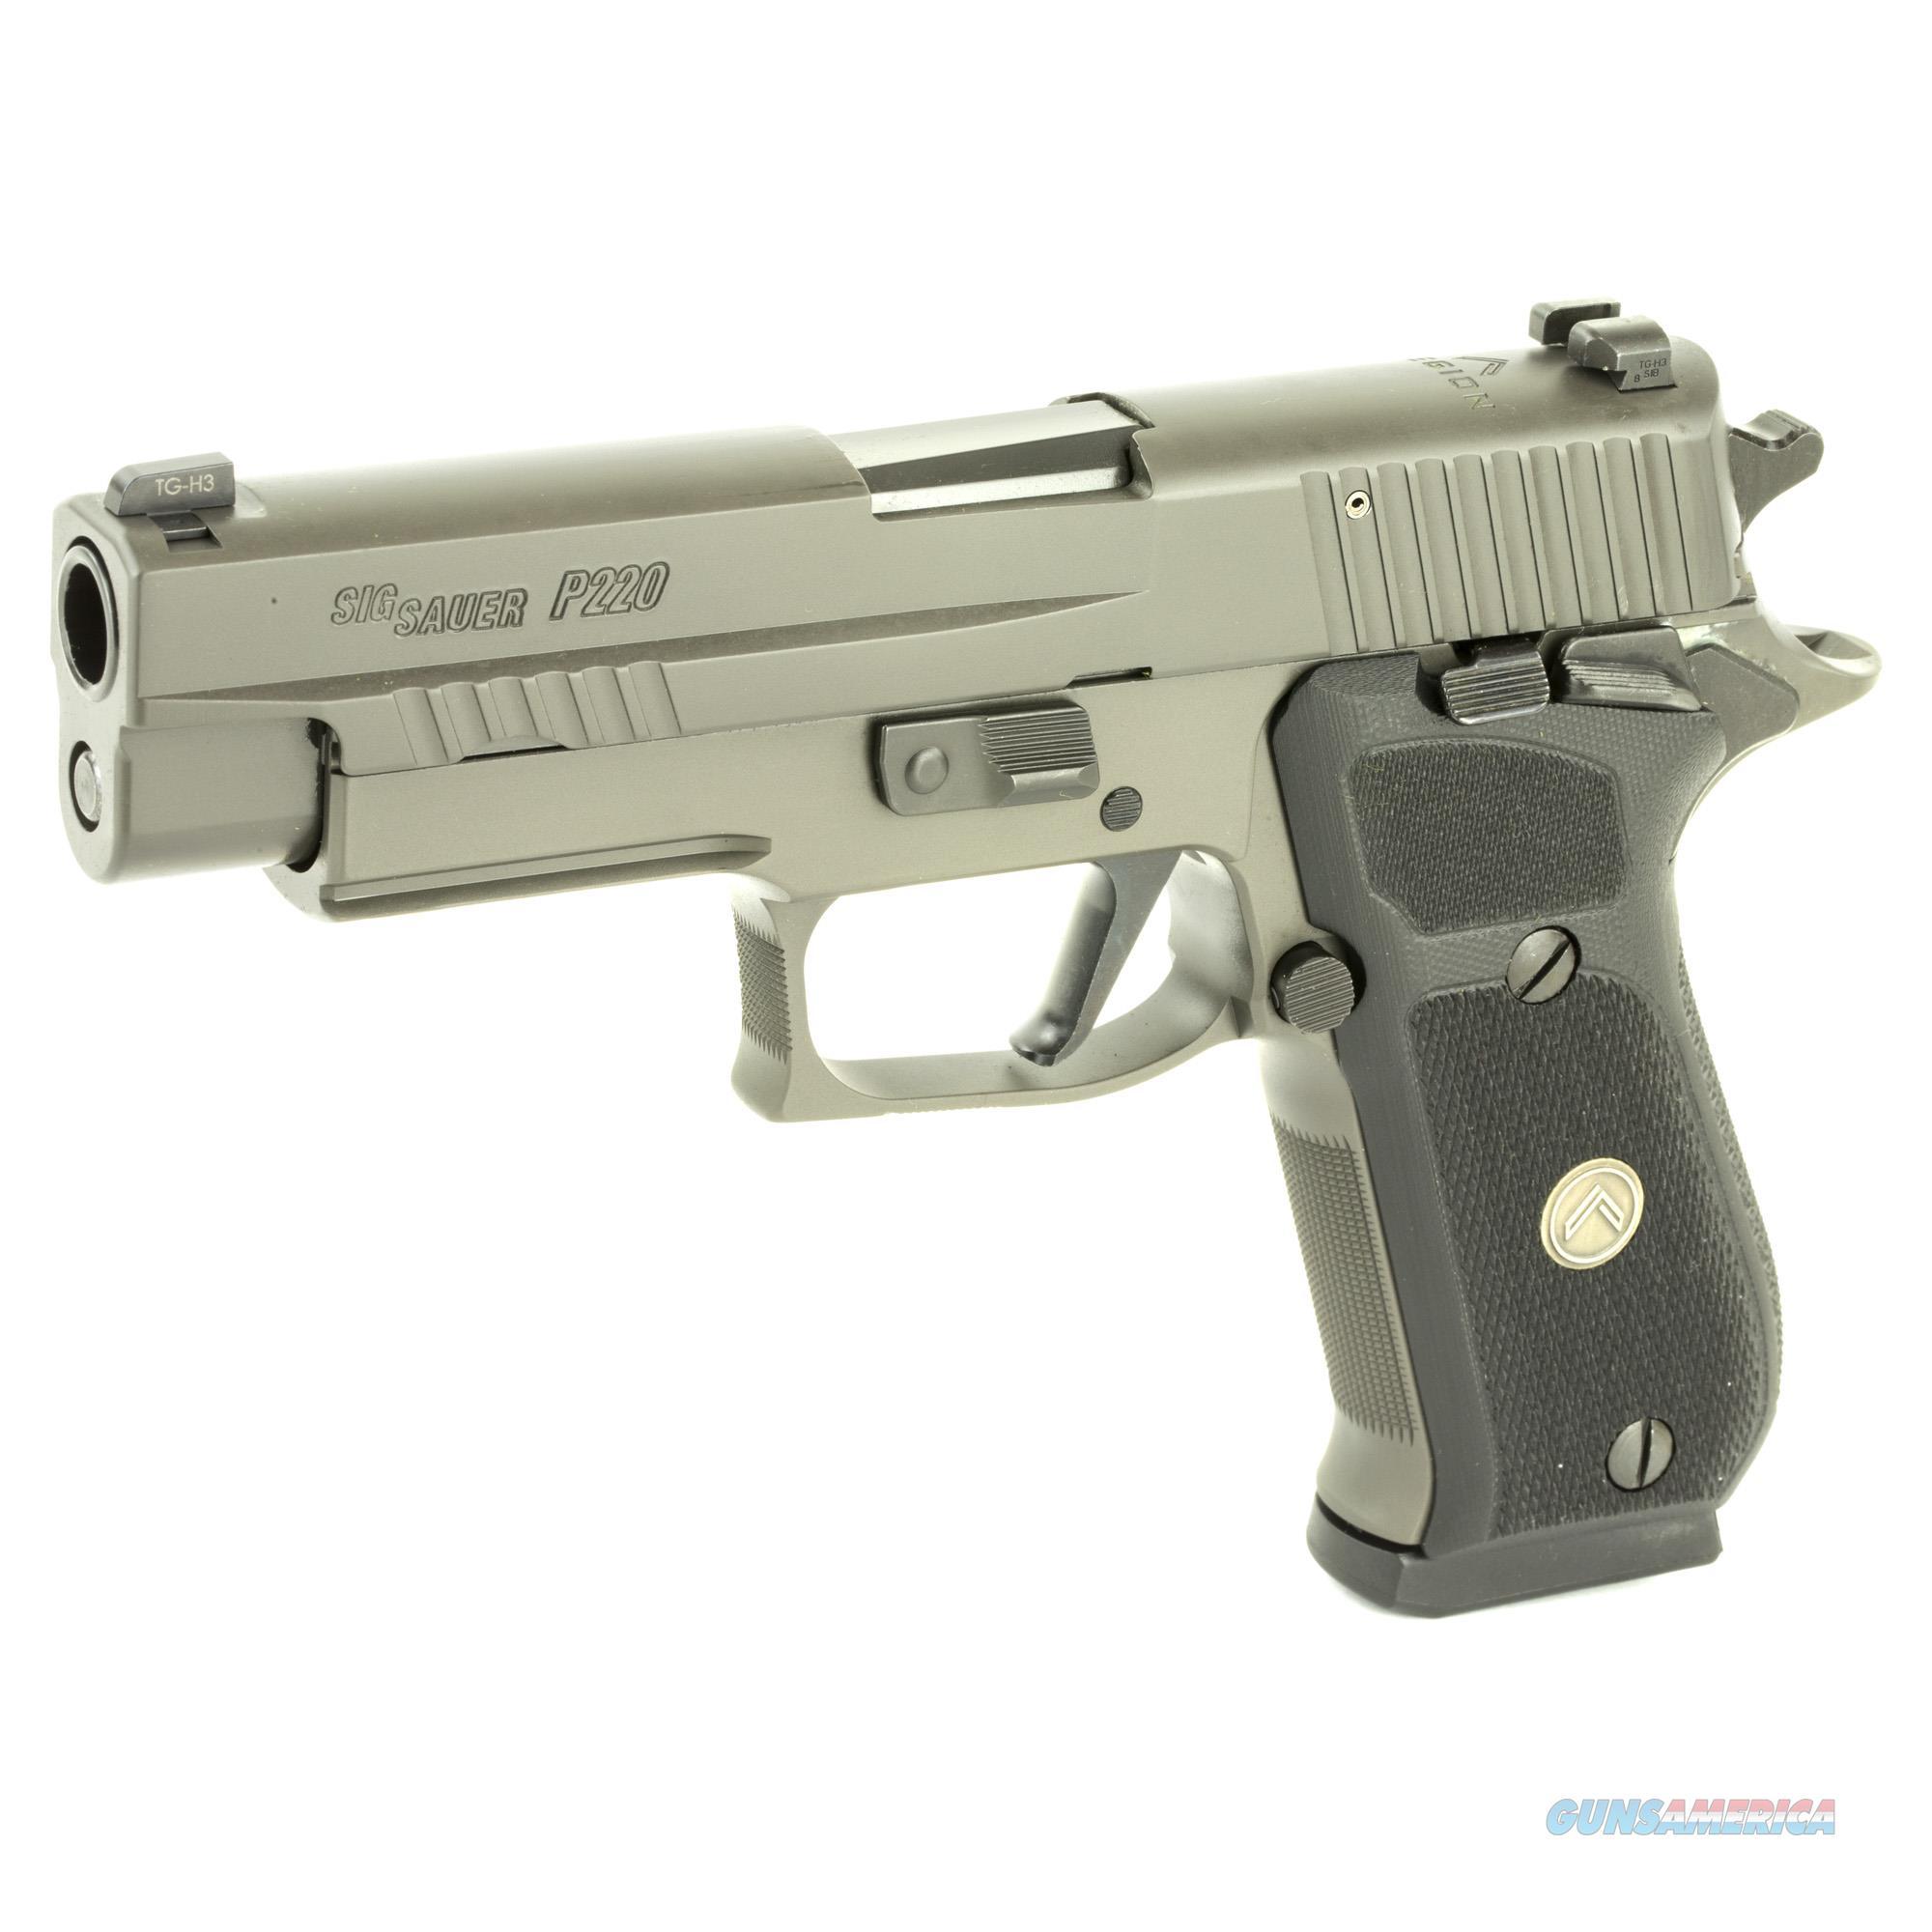 "Sig Sauer P220 Fulls Size Legion SAO .45 ACP 4.4"" 8+1 Legion Gray - New in Case  Guns > Pistols > Sig - Sauer/Sigarms Pistols > P220"